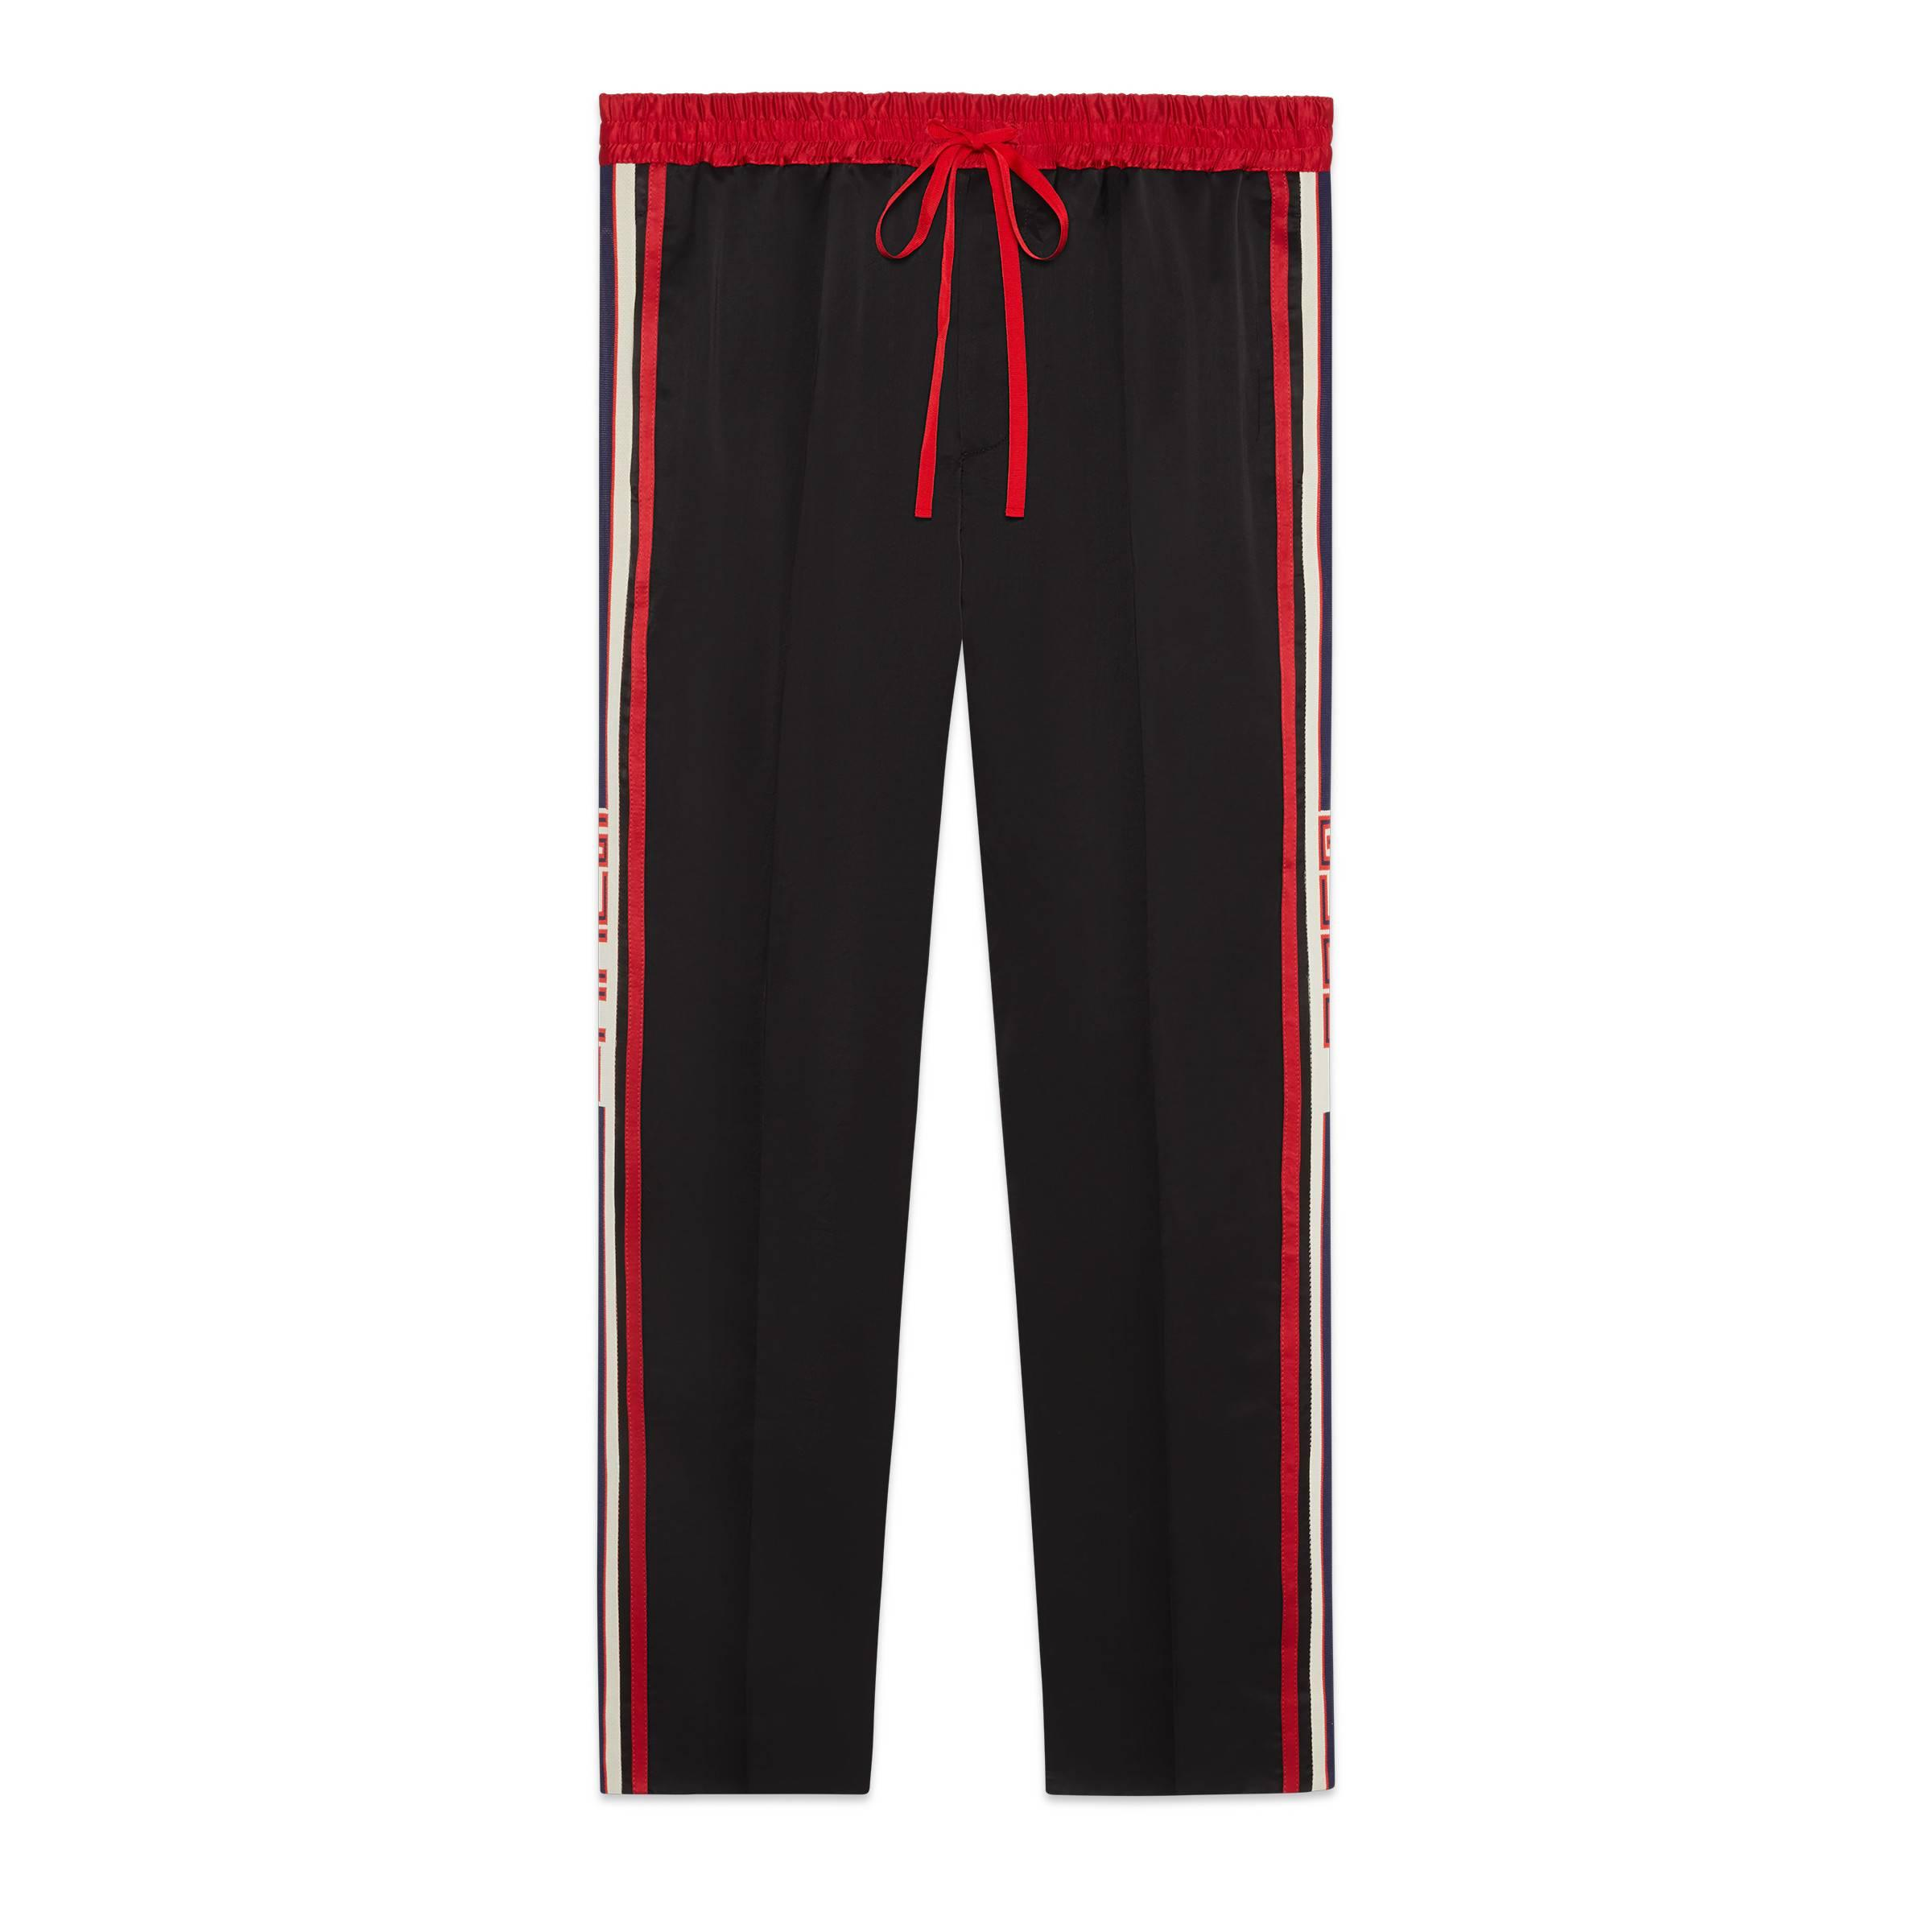 4c2faee54 Pantalón de Chándal de Acetato Gucci de hombre de color Negro - Lyst